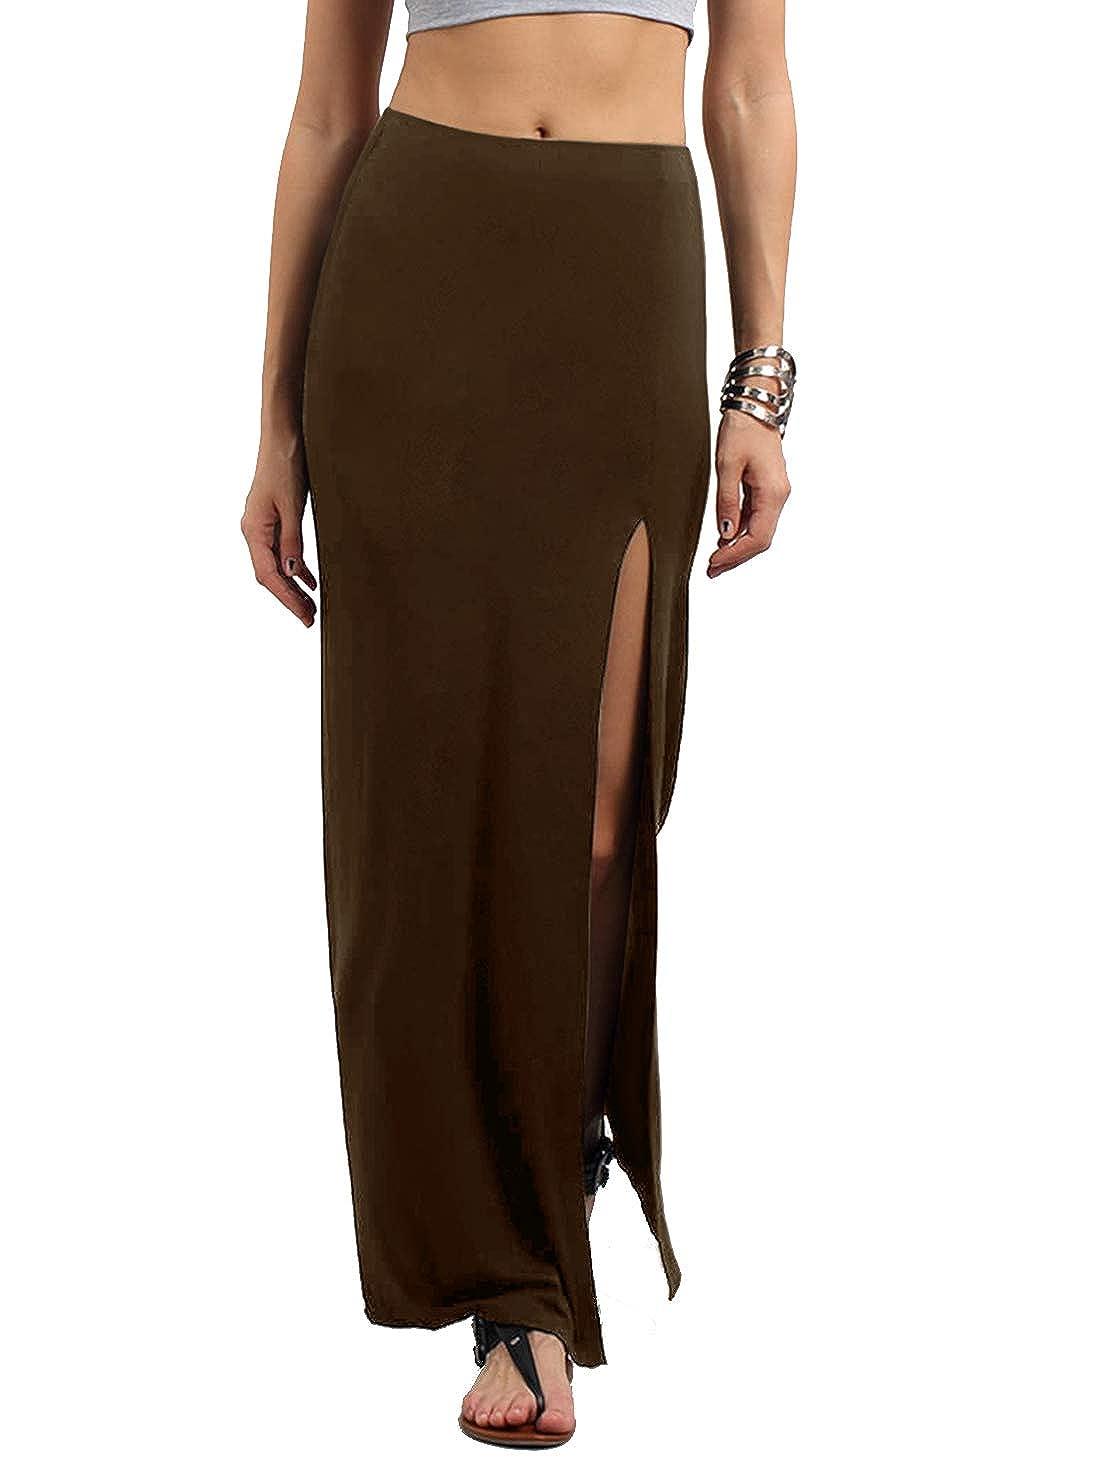 Brown Verdusa Women's Solid color High Waist Side Split Maxi Skirt